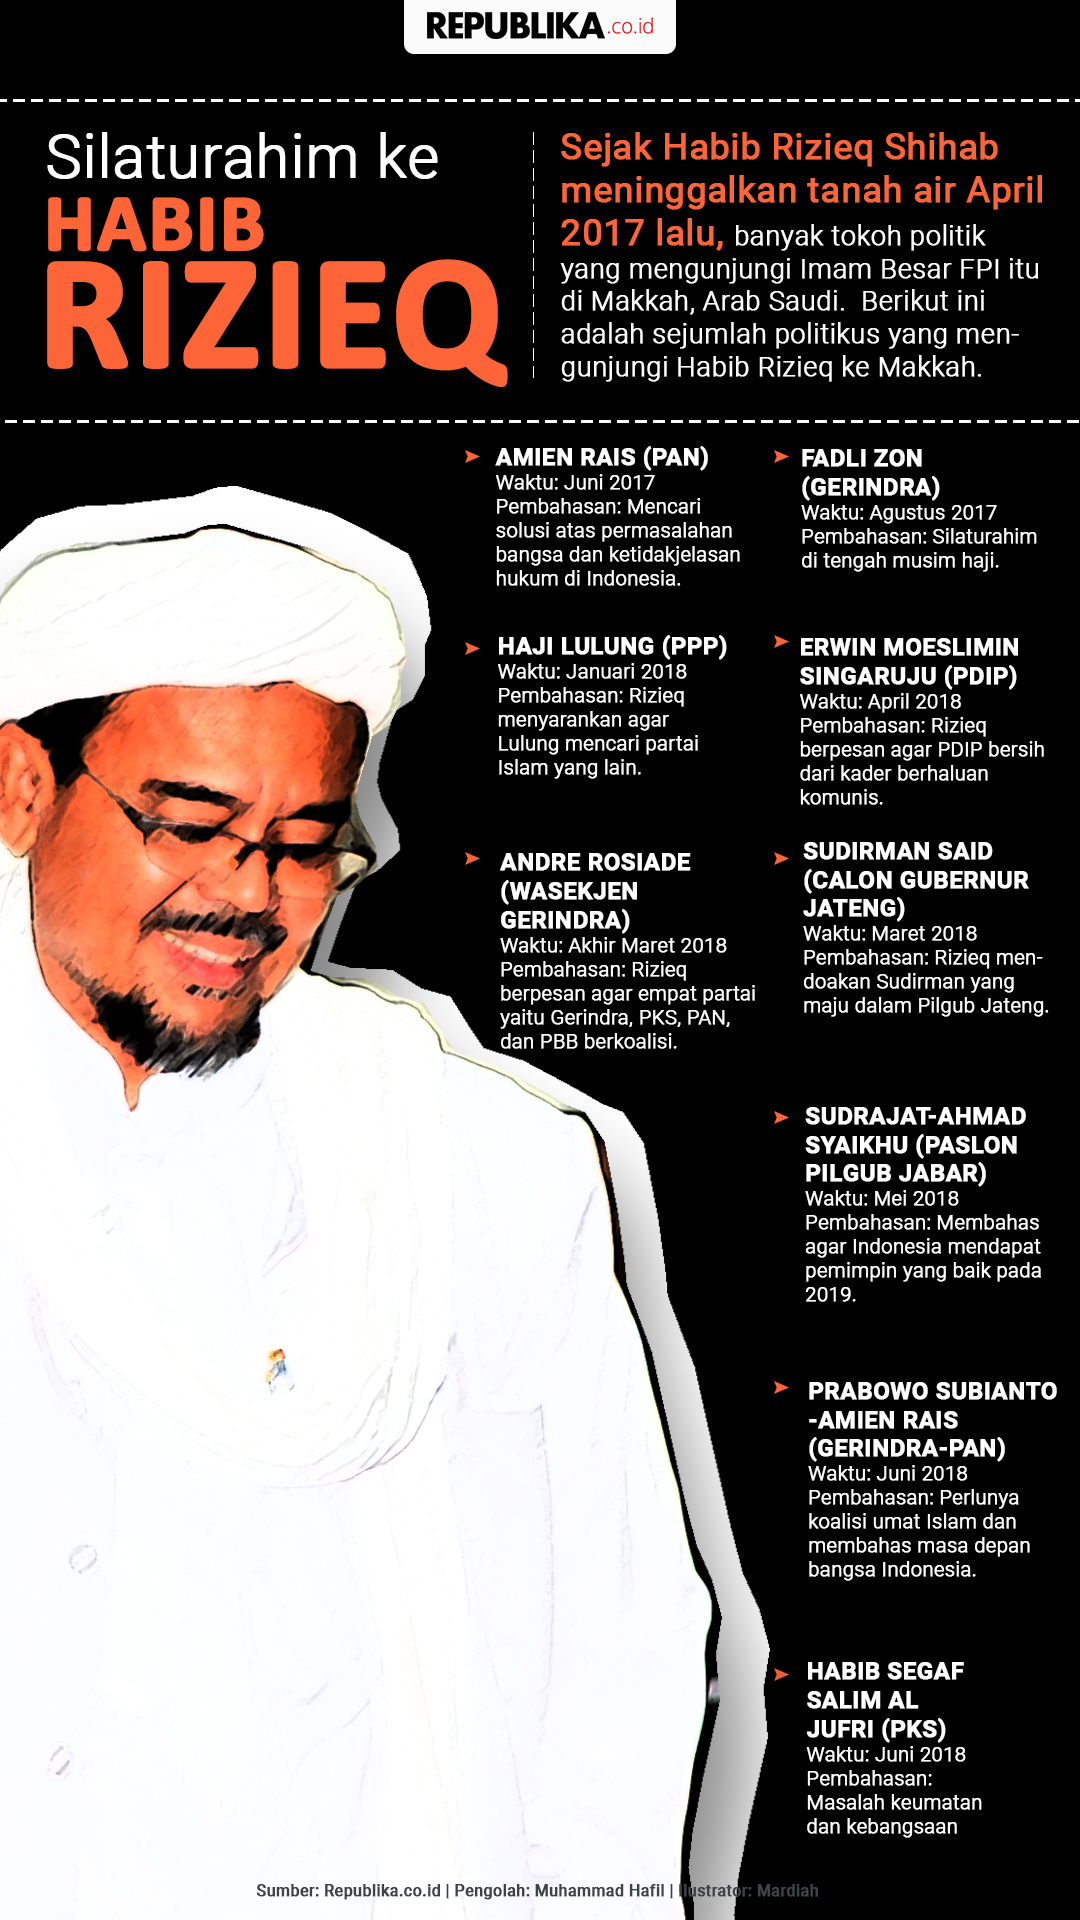 Silaturahim ke Habib Rizieq